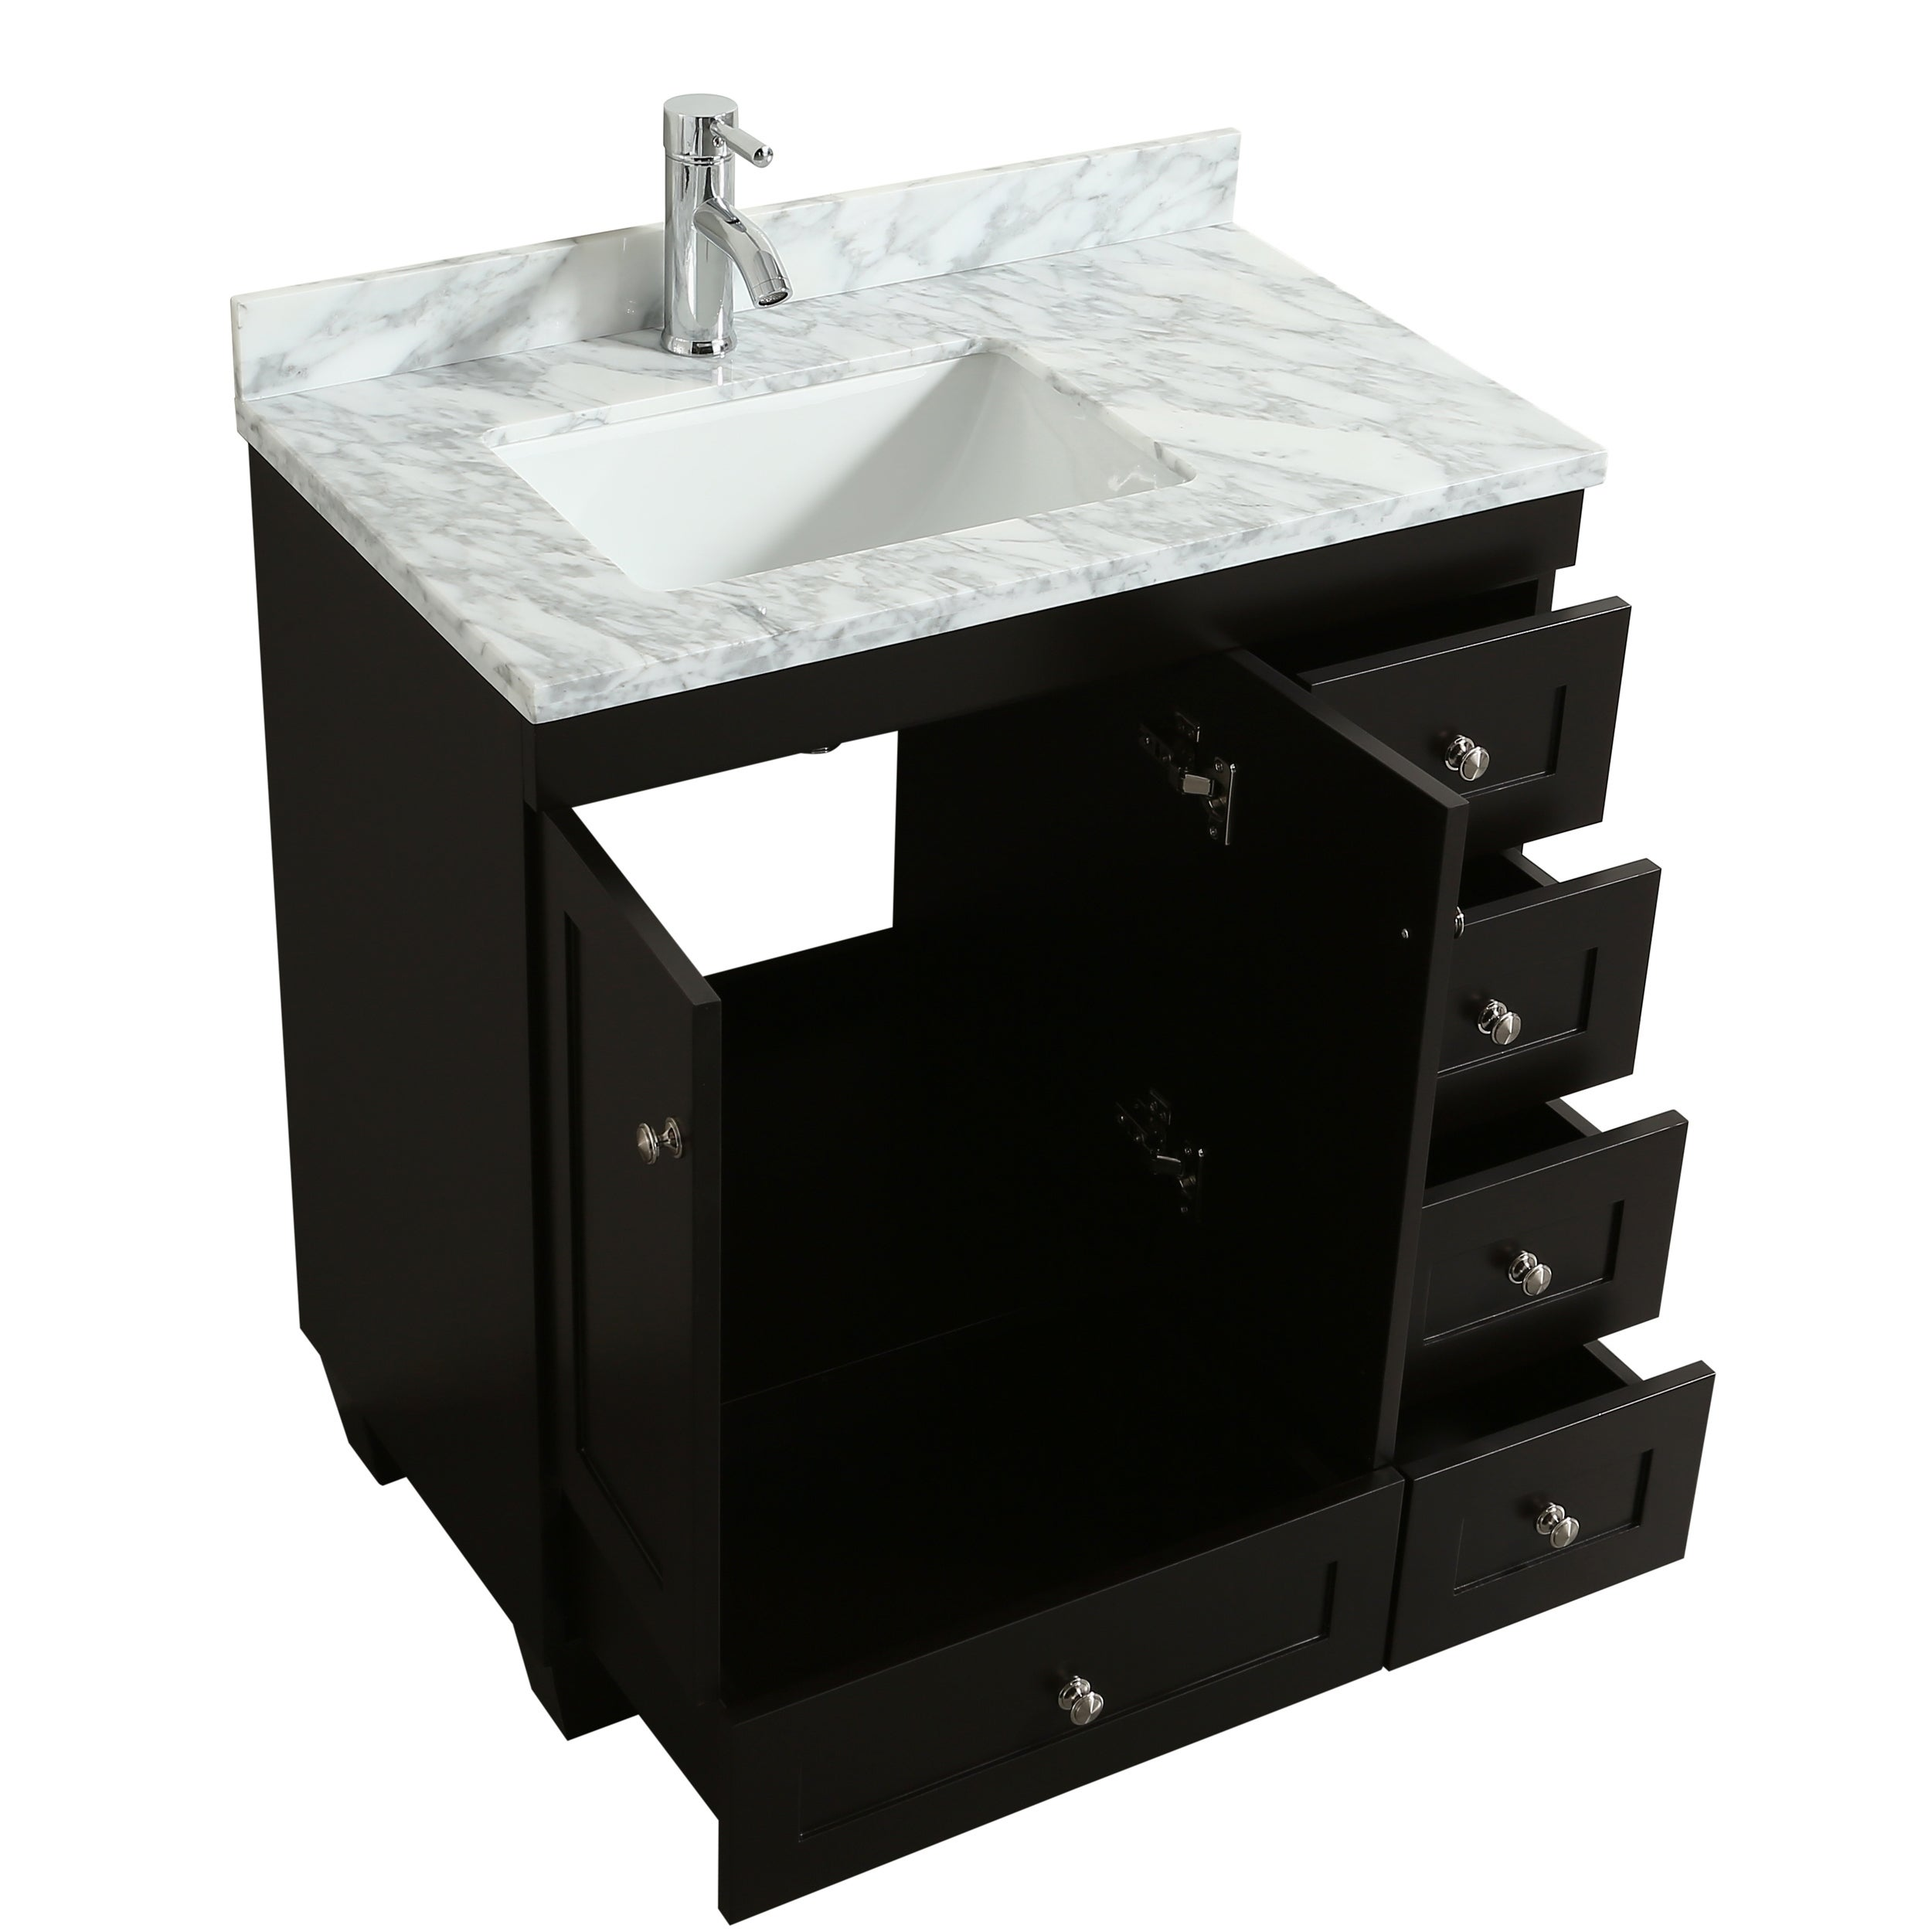 Eviva Hy 30 X 18 Espresso Bathroom Vanity Free Shipping Today 20817210